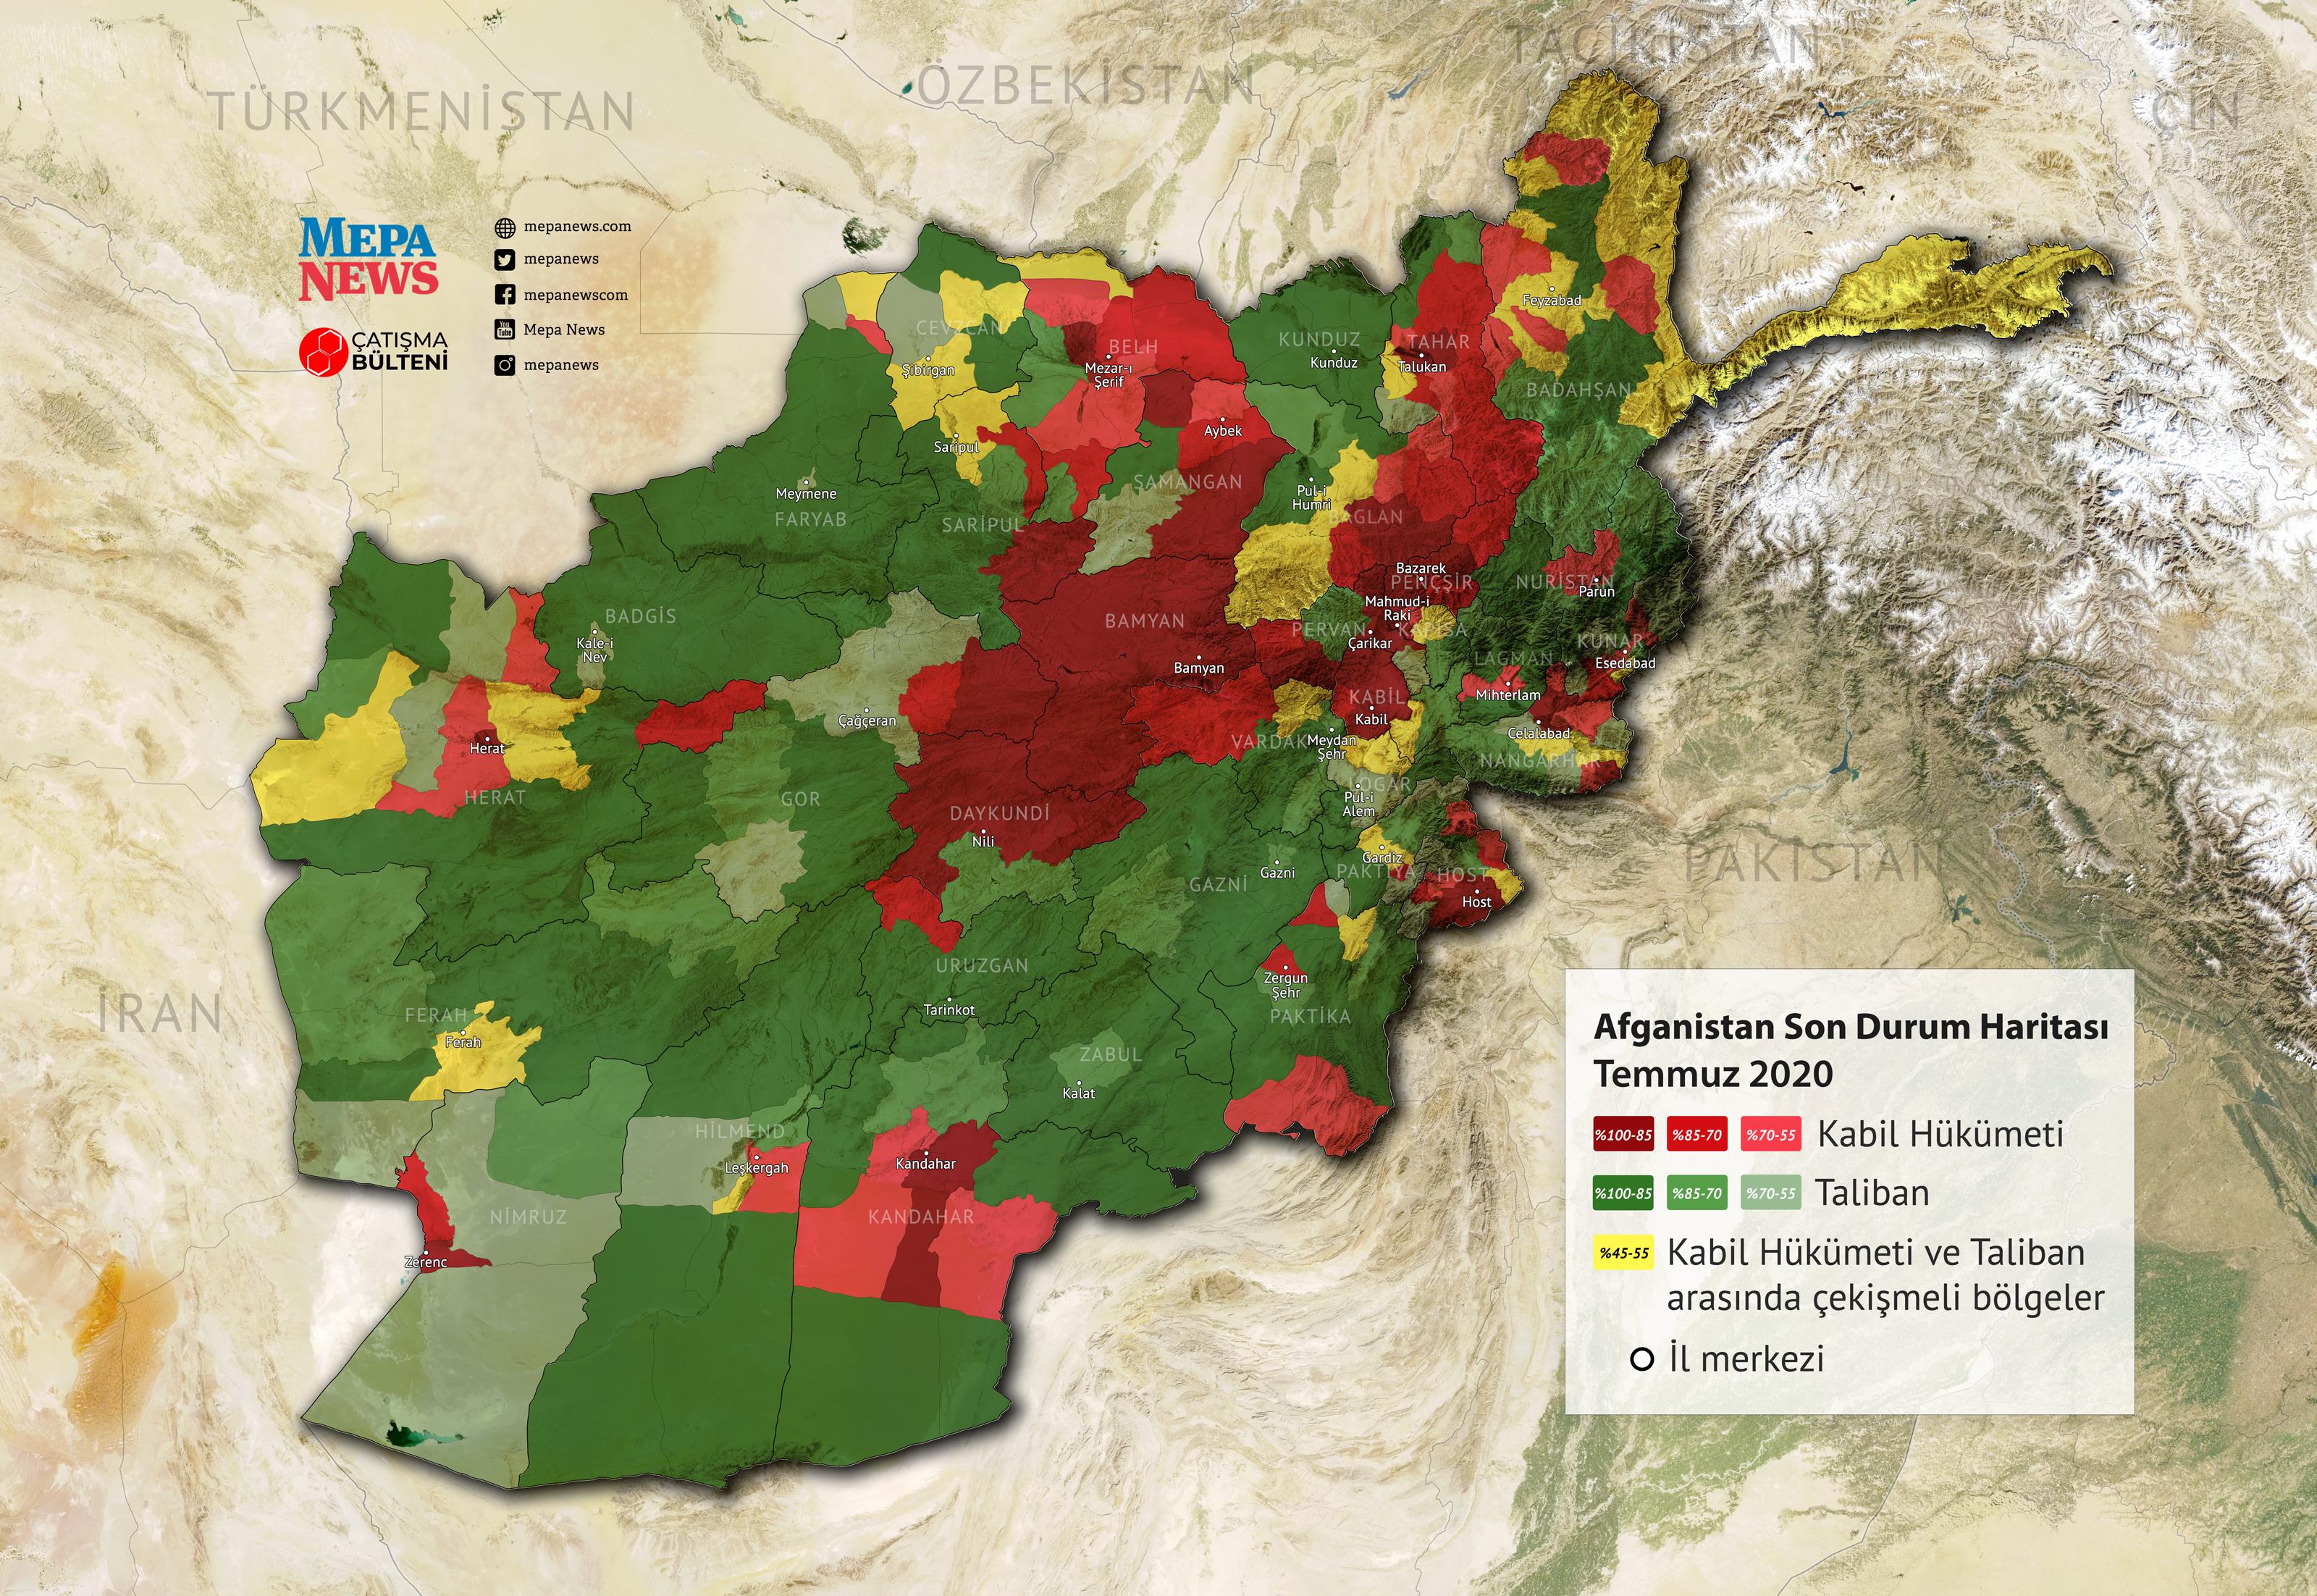 afganharitatemmuz2020.jpg